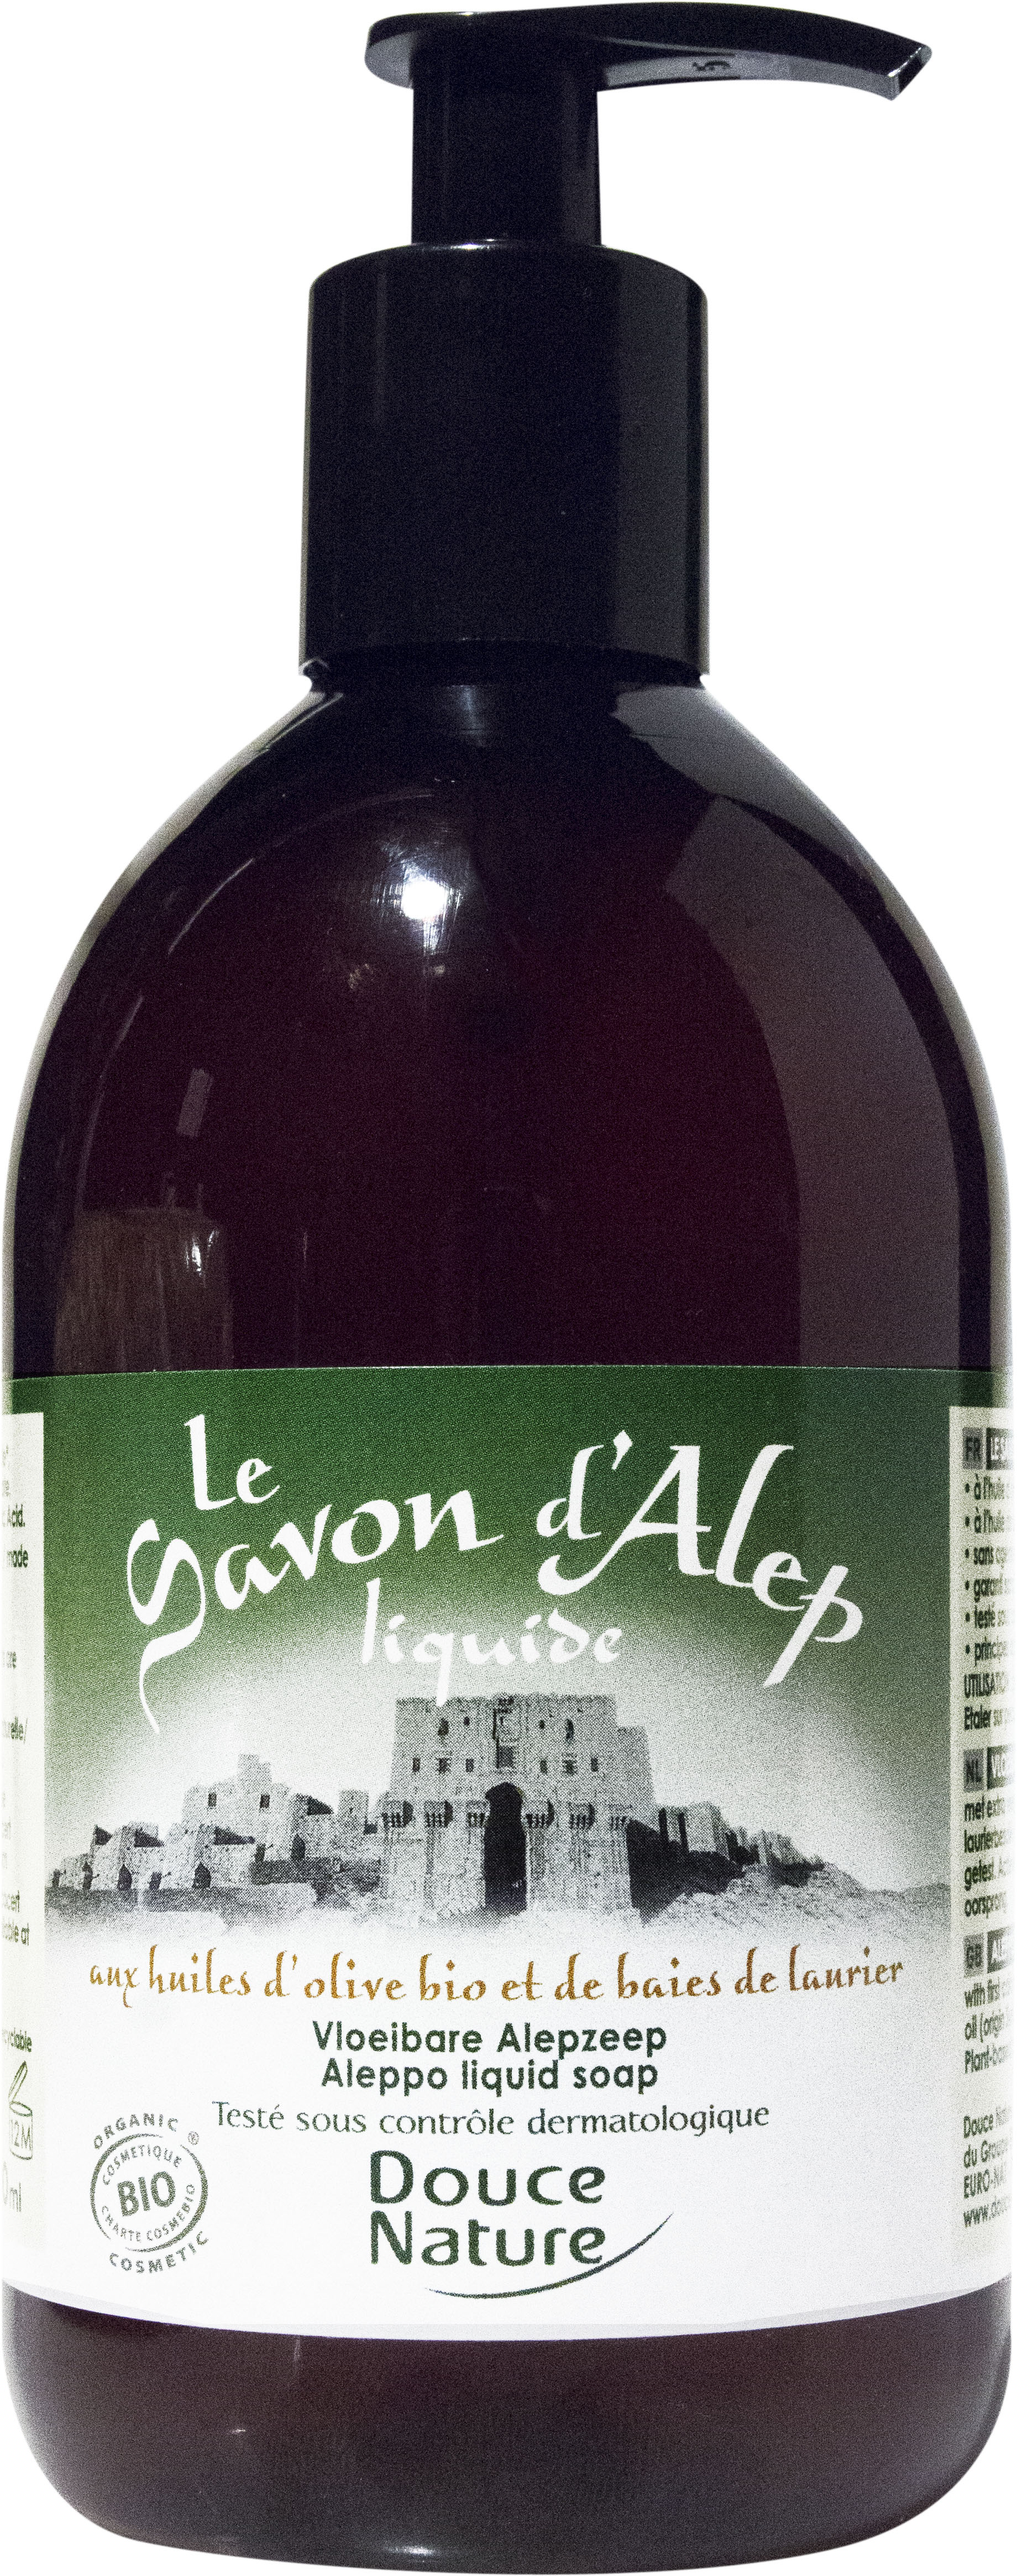 Savon d'Alep liquide, Douce Nature (500 ml)